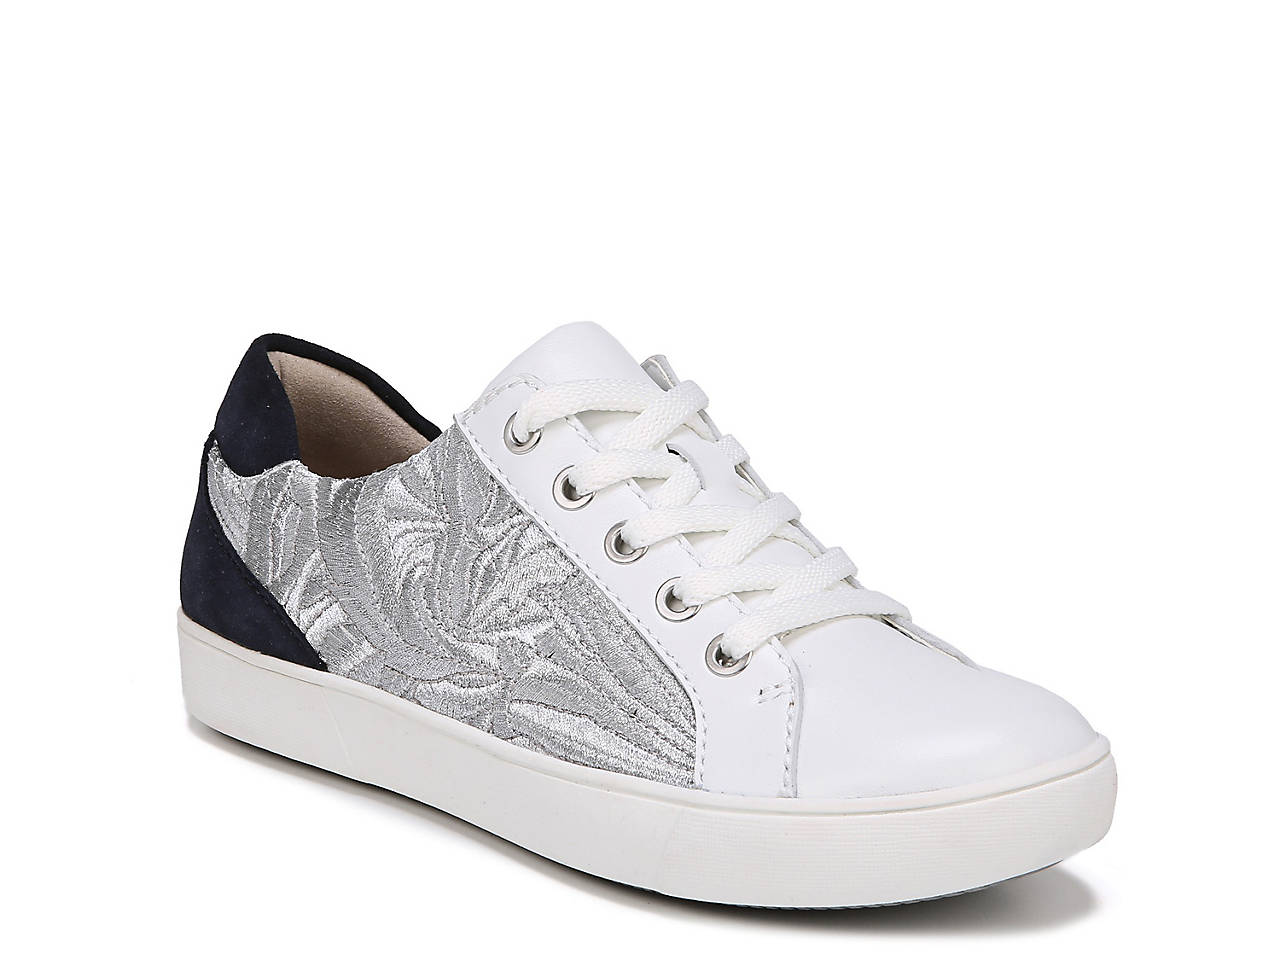 a3e4dd9e9c276 Naturalizer Morrison 4 Sneaker Women's Shoes | DSW